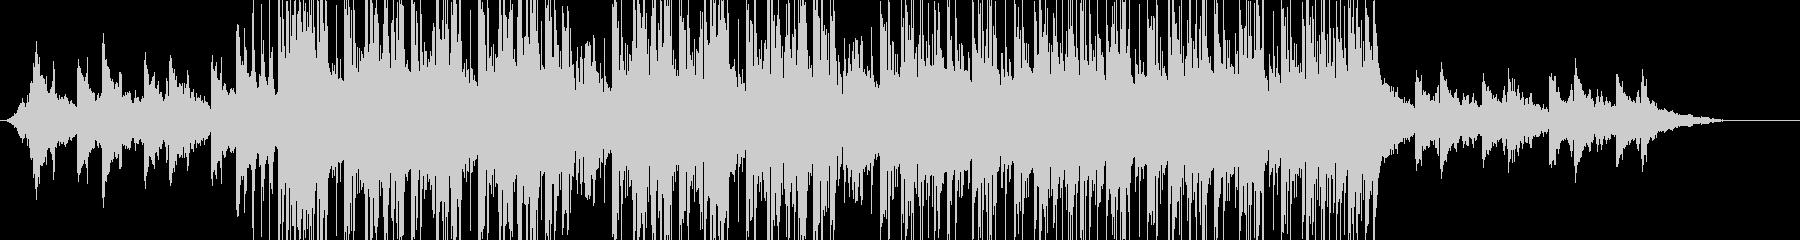 future bass、EDM1-Bの未再生の波形